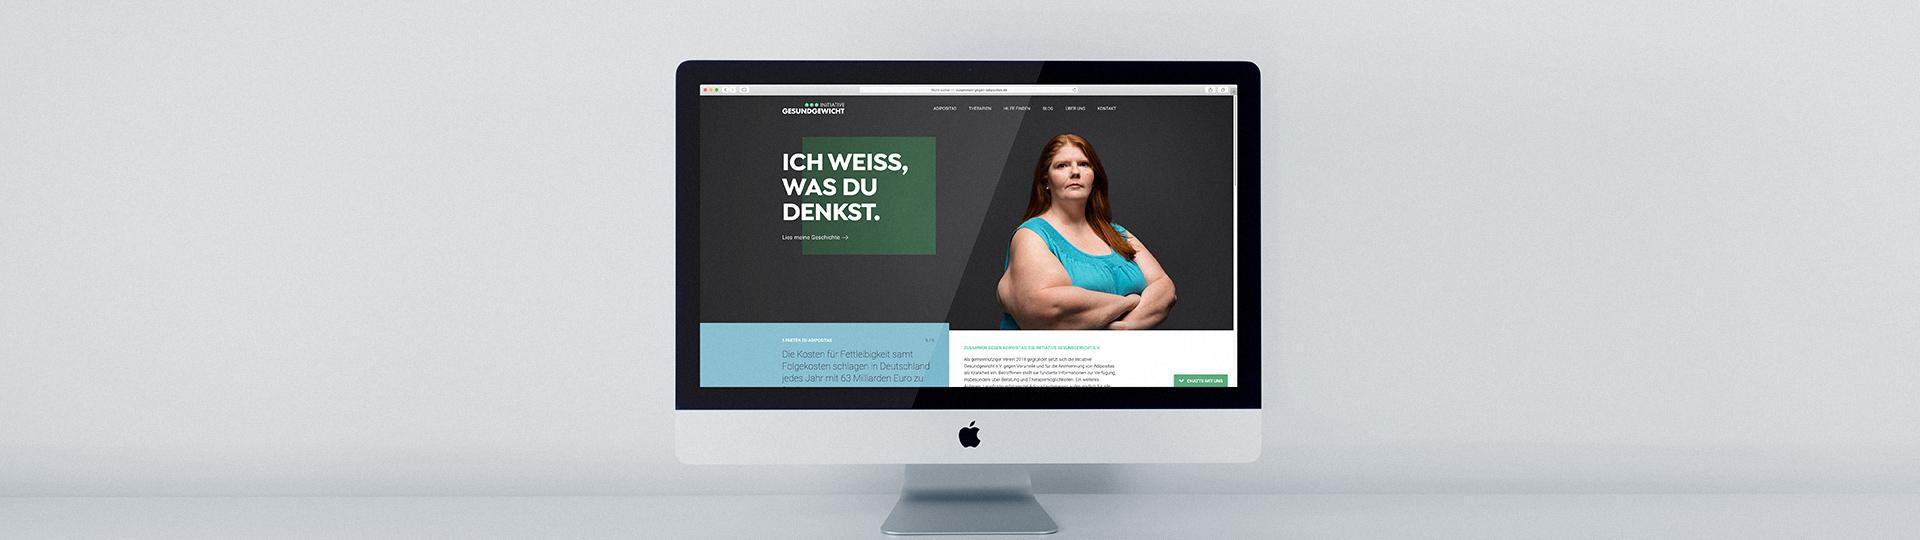 Initiative Gesund Gewicht Adipositas iMac